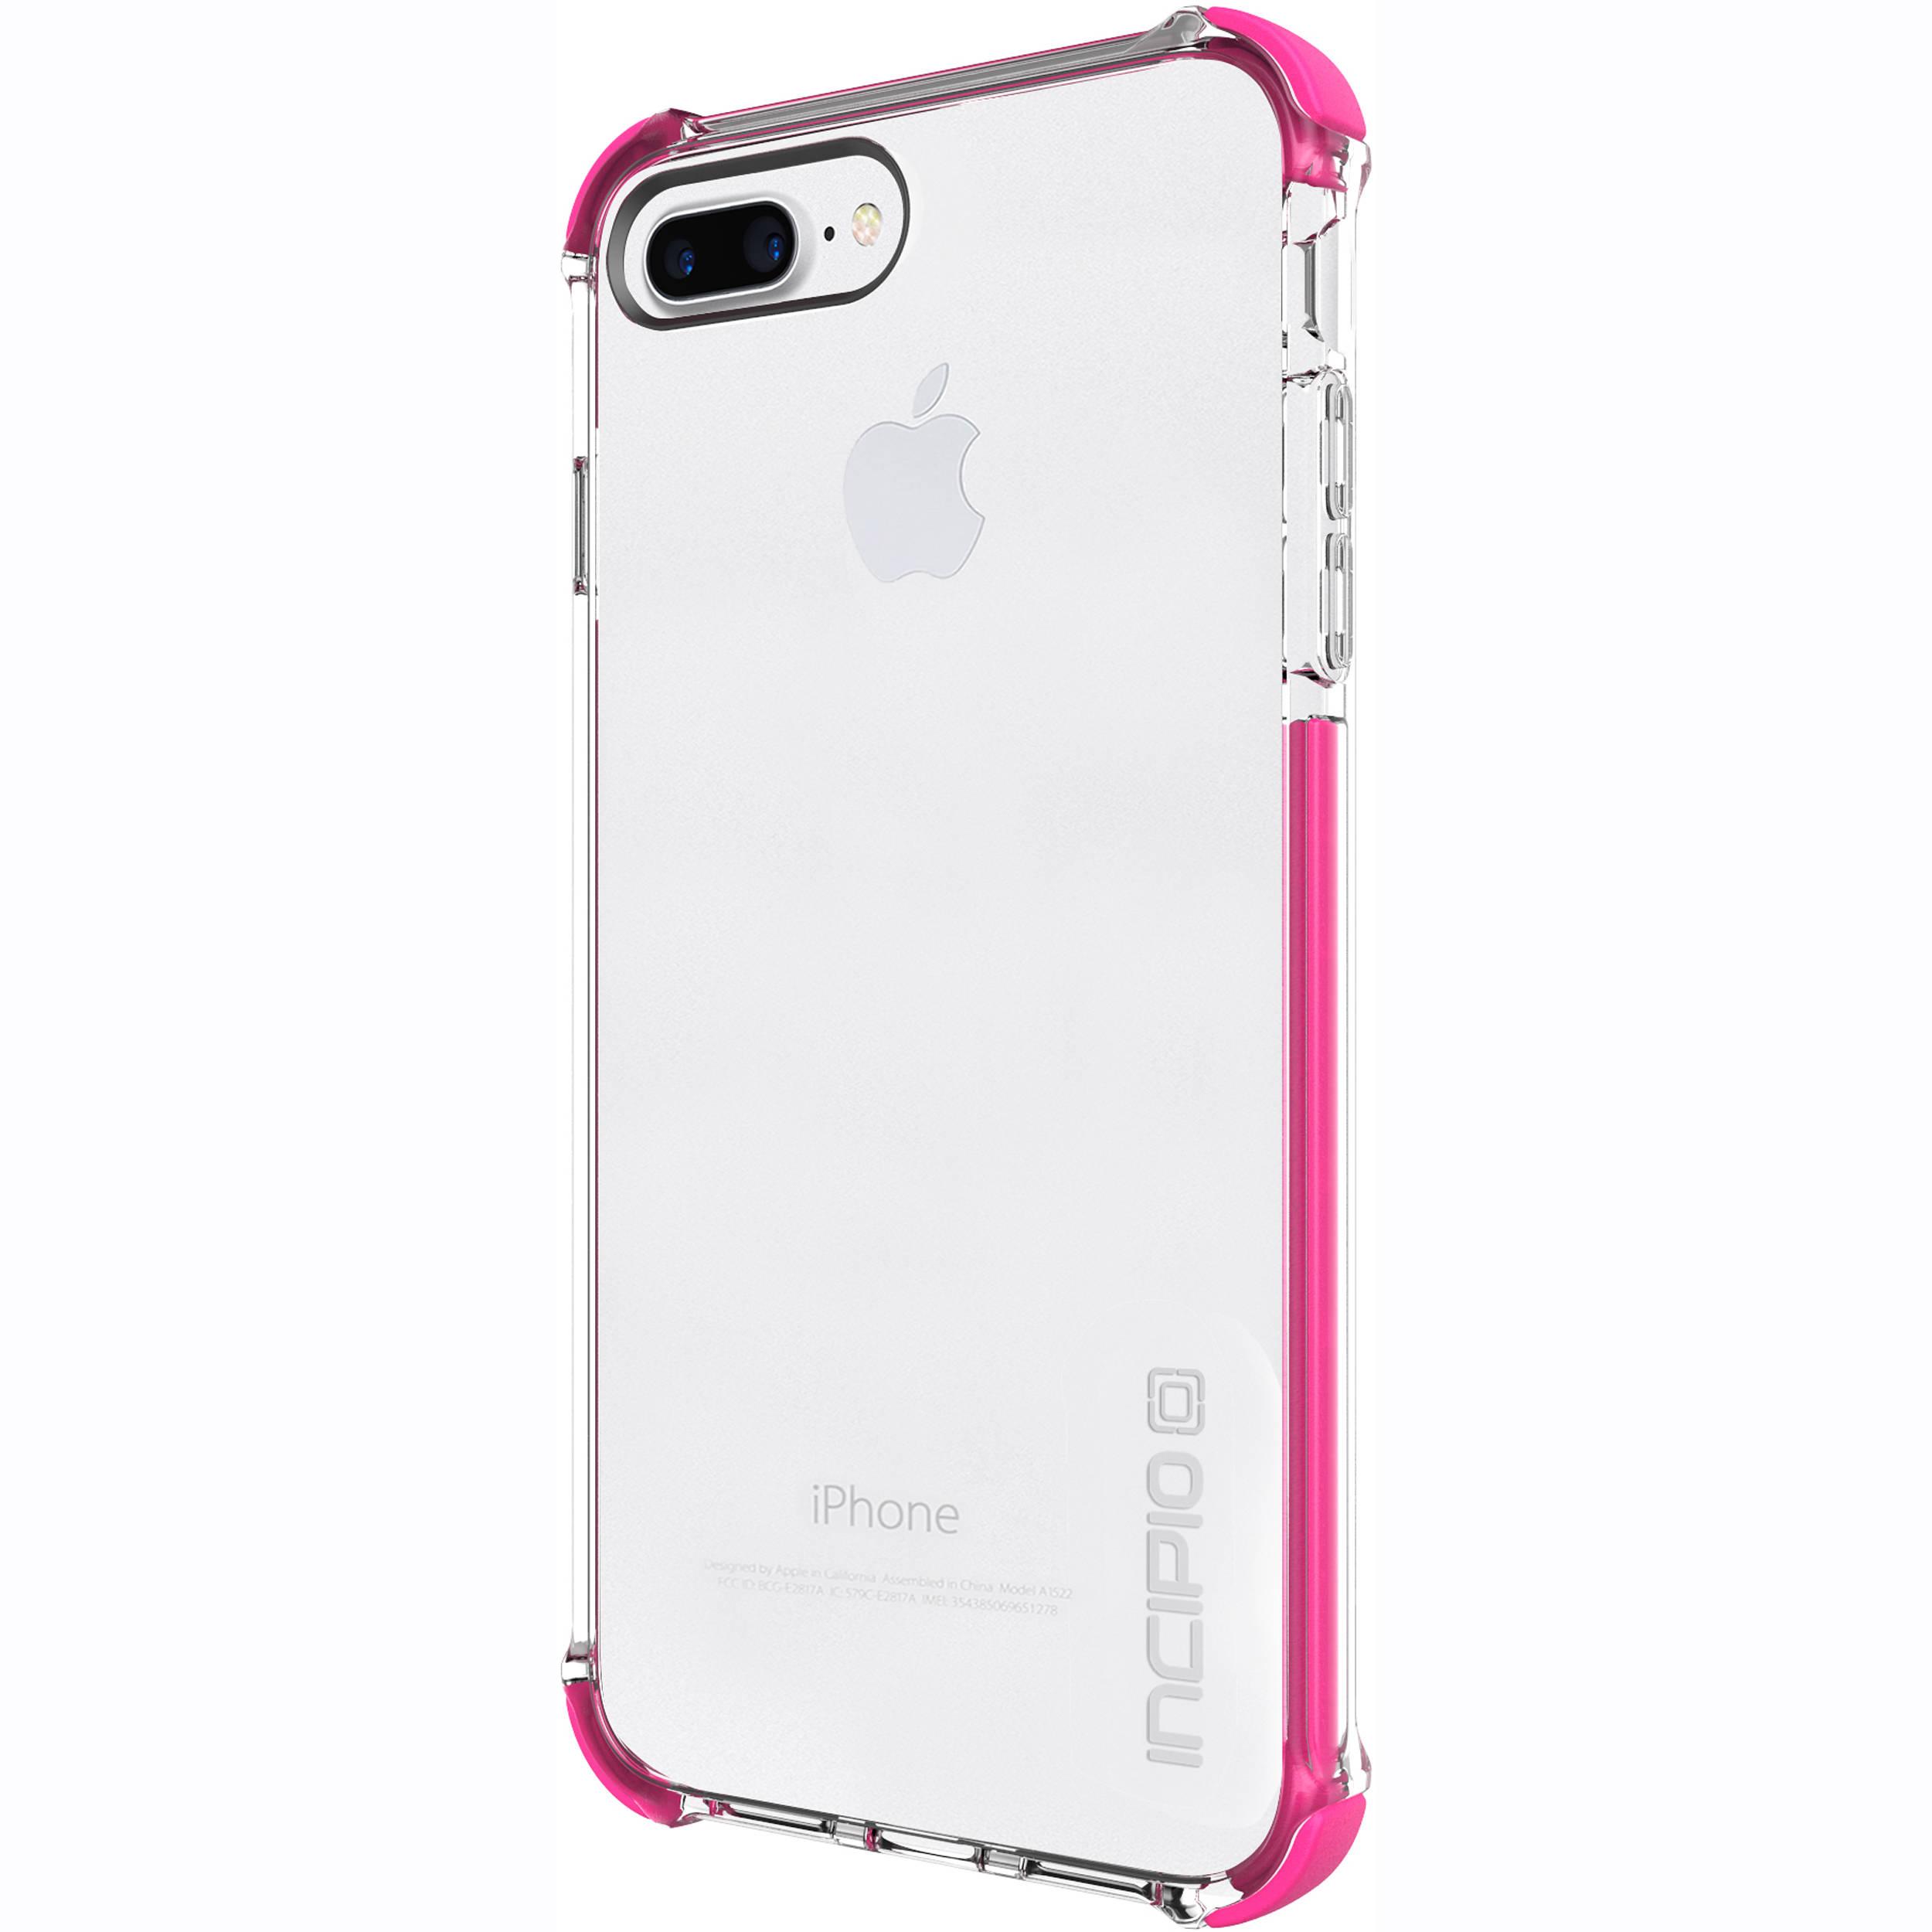 sports shoes 71e7e baae6 Incipio Reprieve [SPORT] Case for iPhone 7 Plus (Clear/Pink)